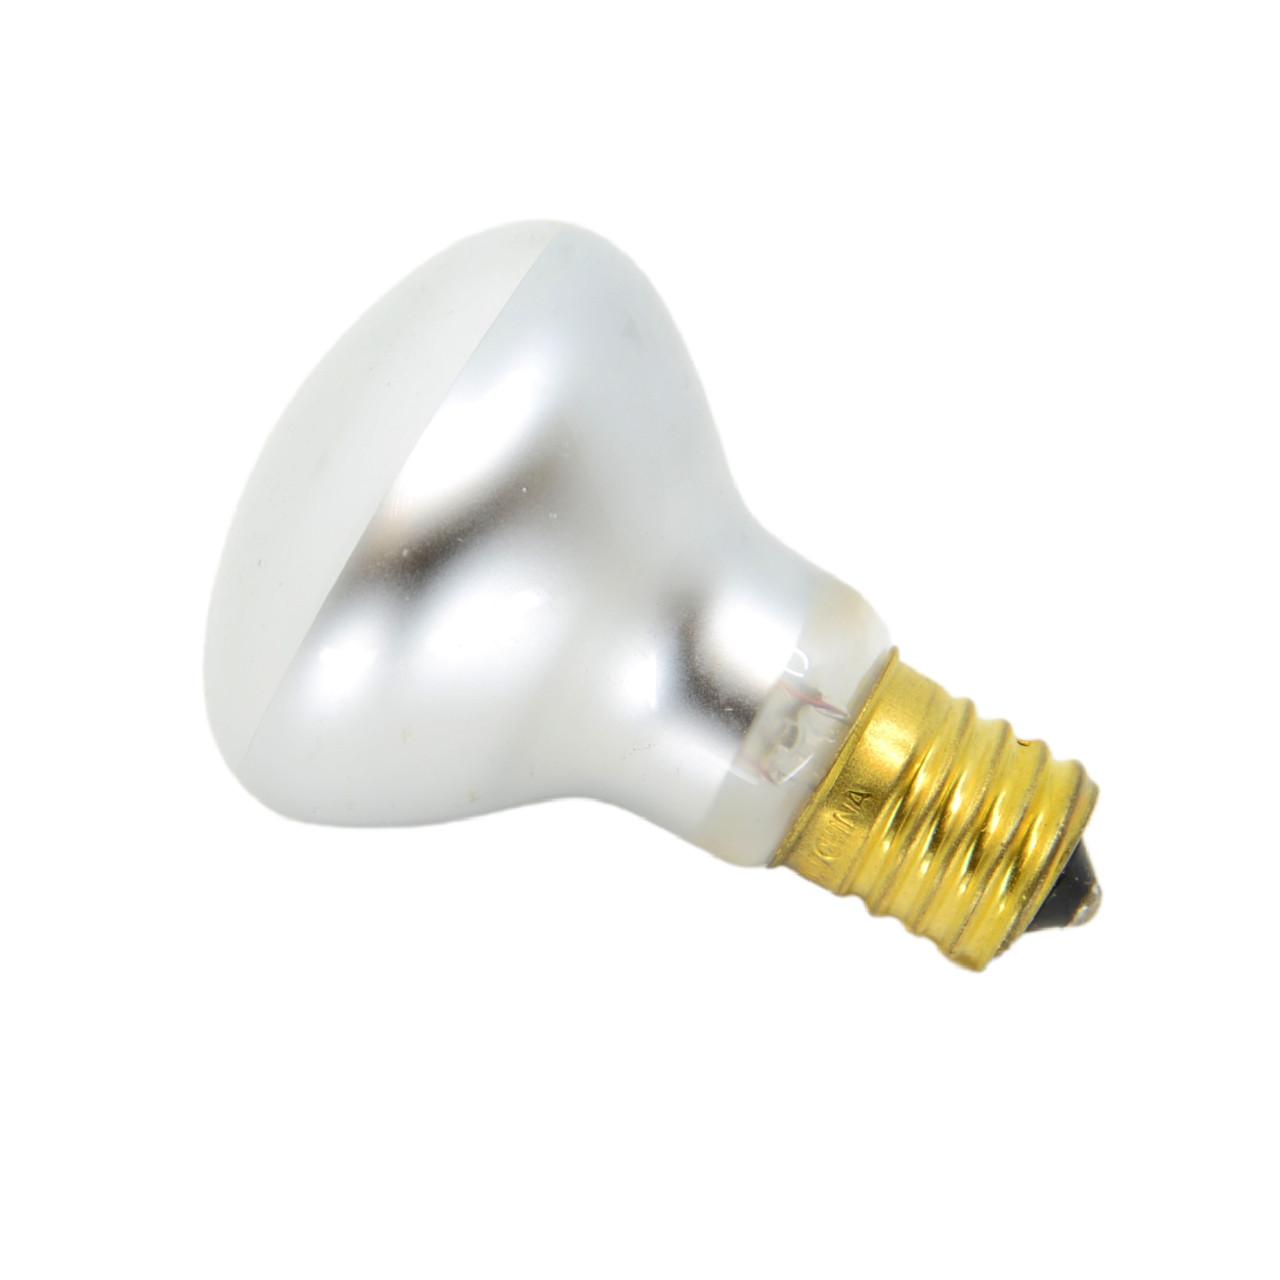 Bulb For Big Eye Lamps - 40W Reflector Spot